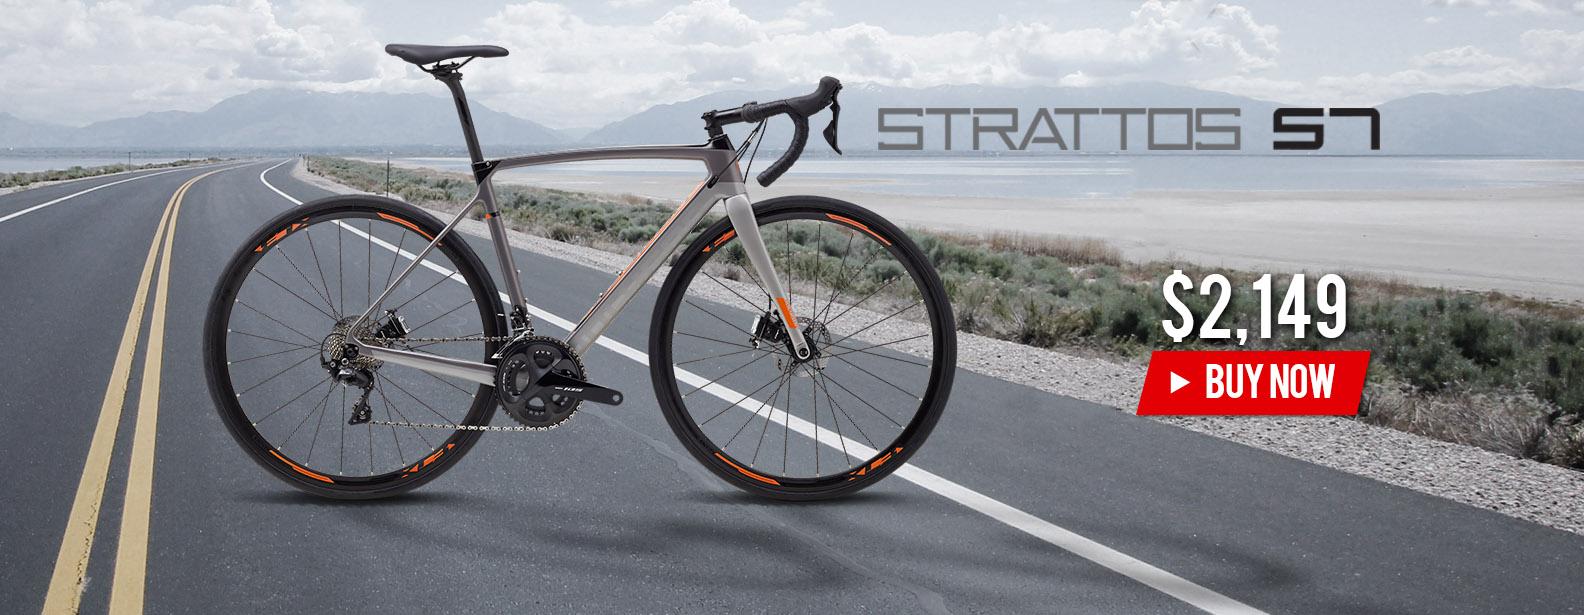 Polygon Strattos S7 Road Bike